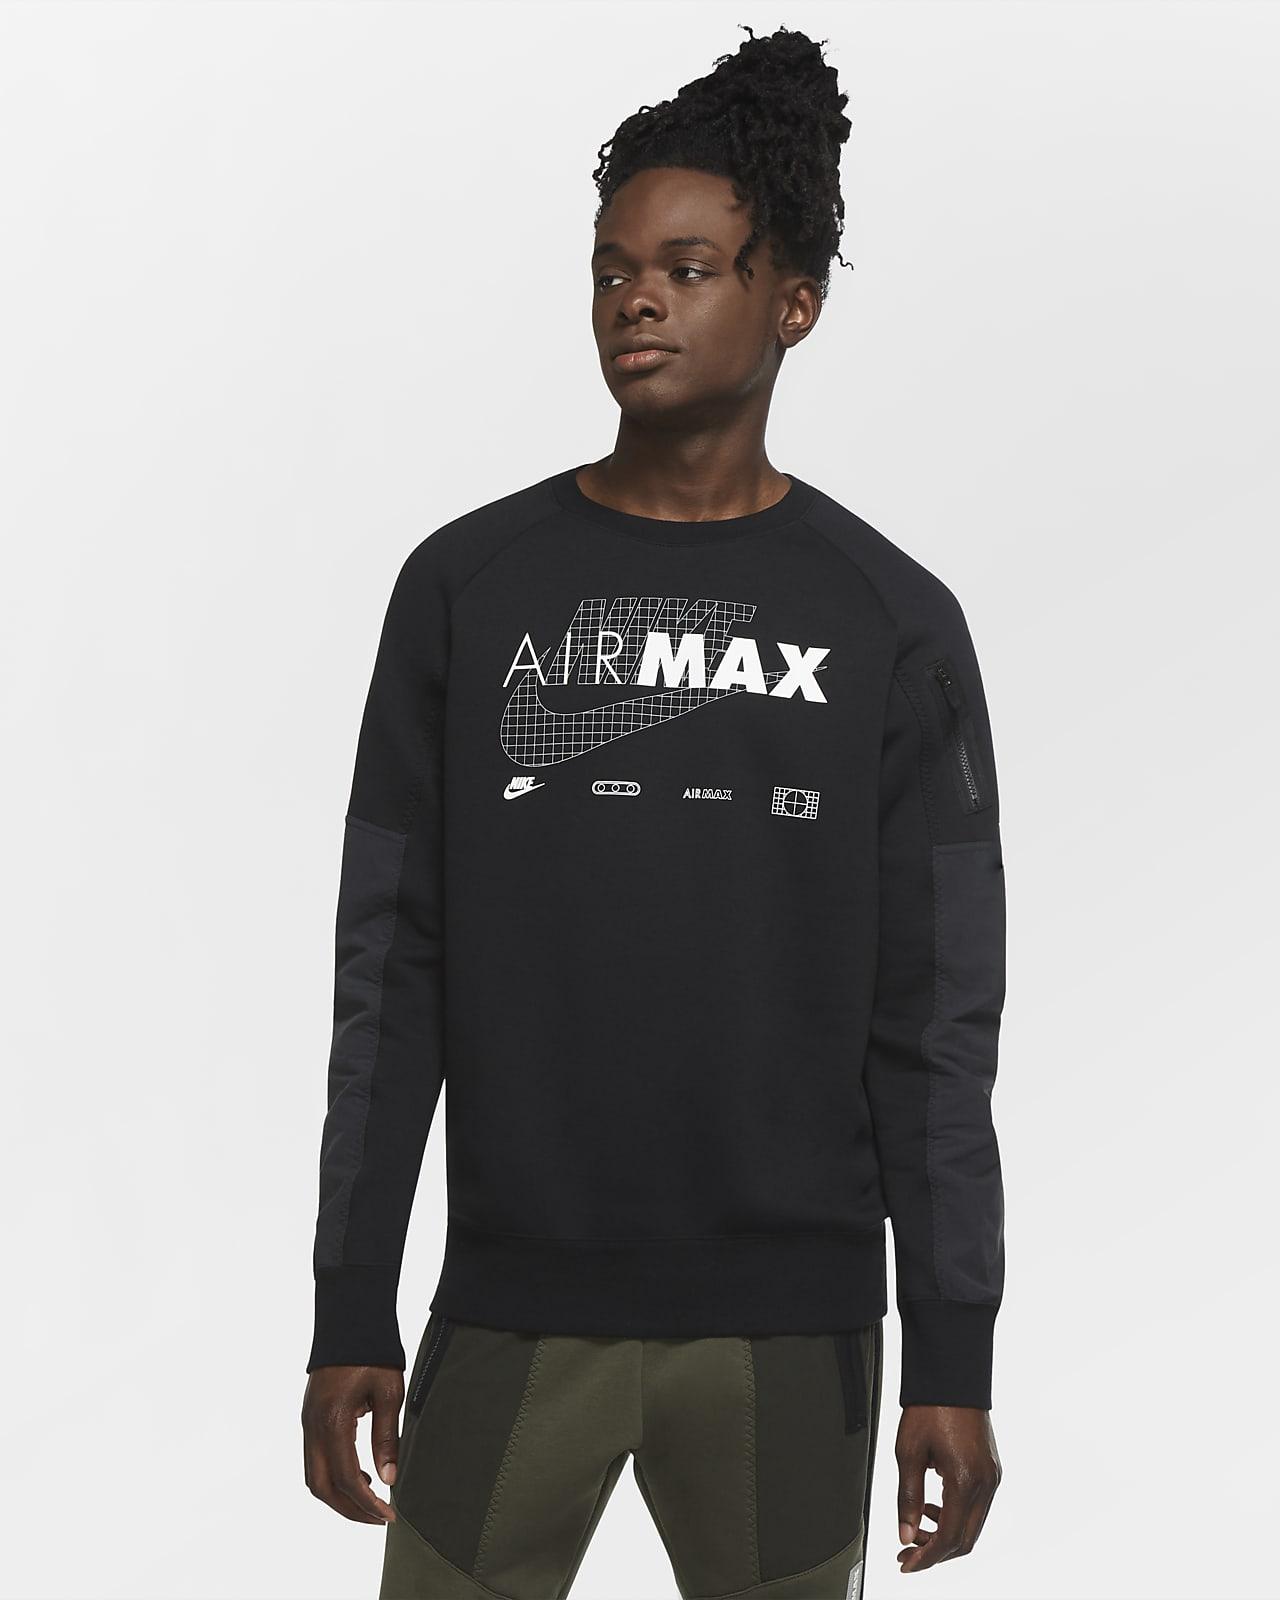 Nike Sportswear Air Max Fleece Erkek Crew Üstü